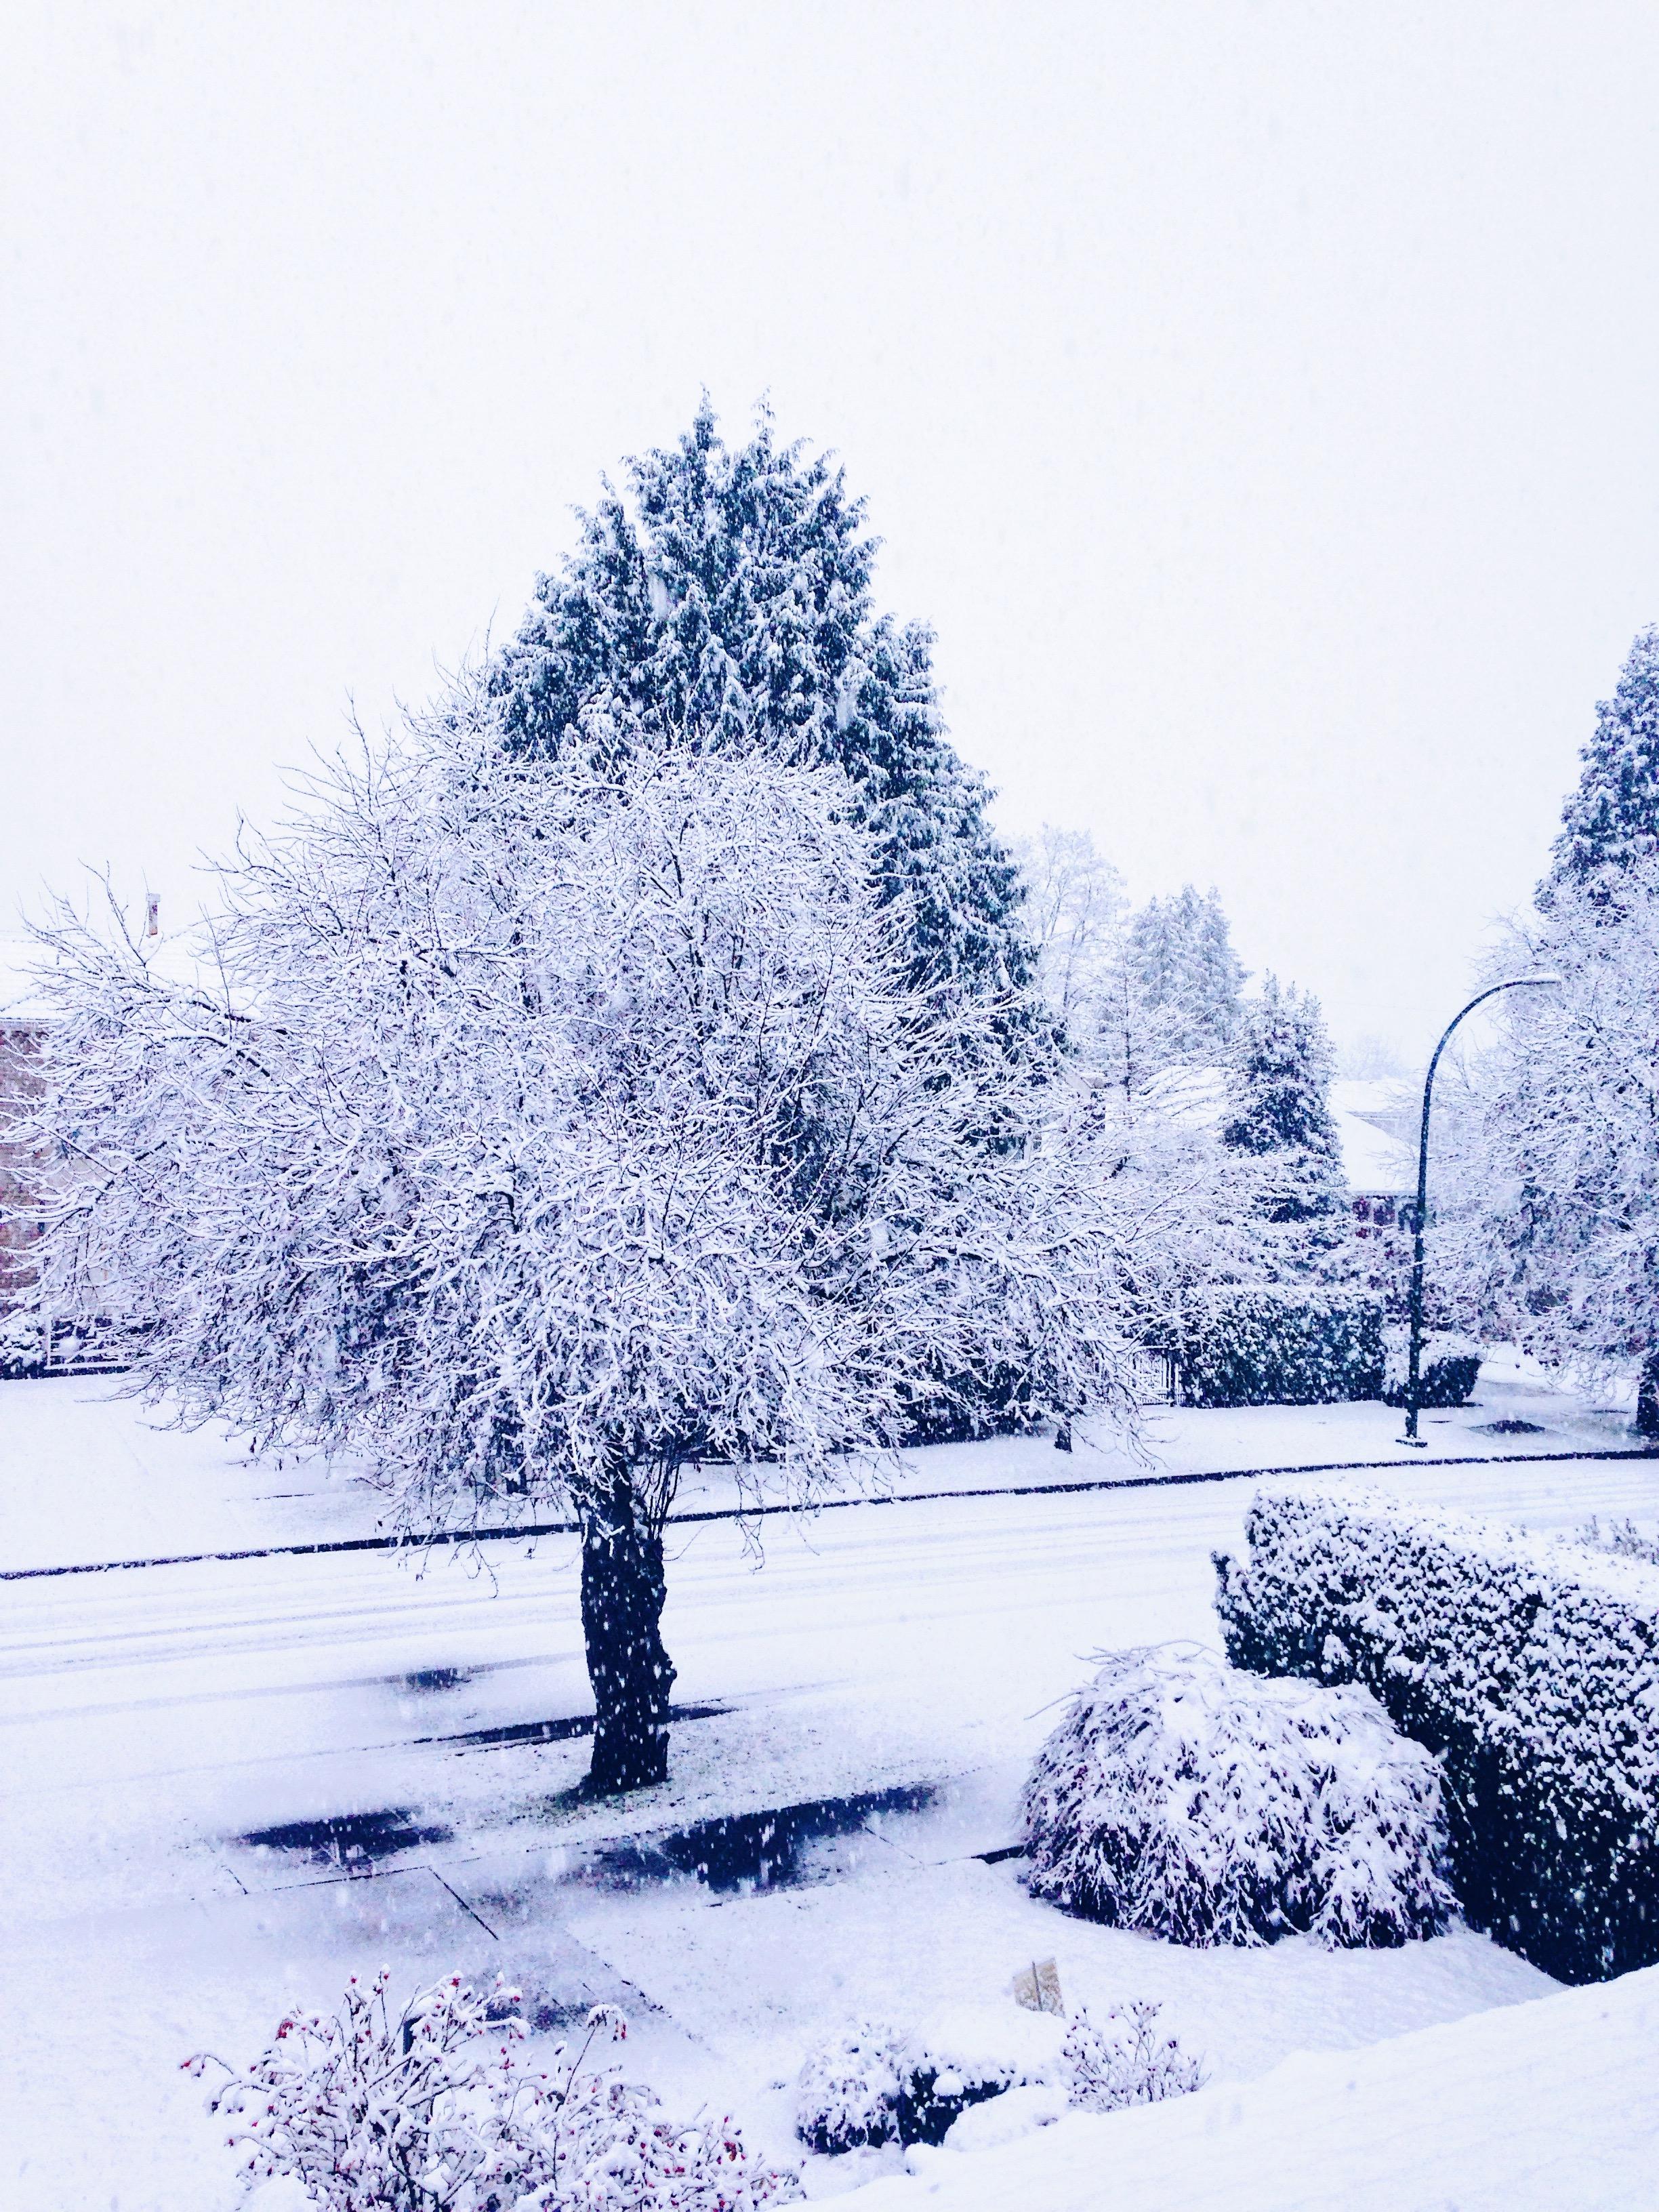 My favorite photos of winter so far